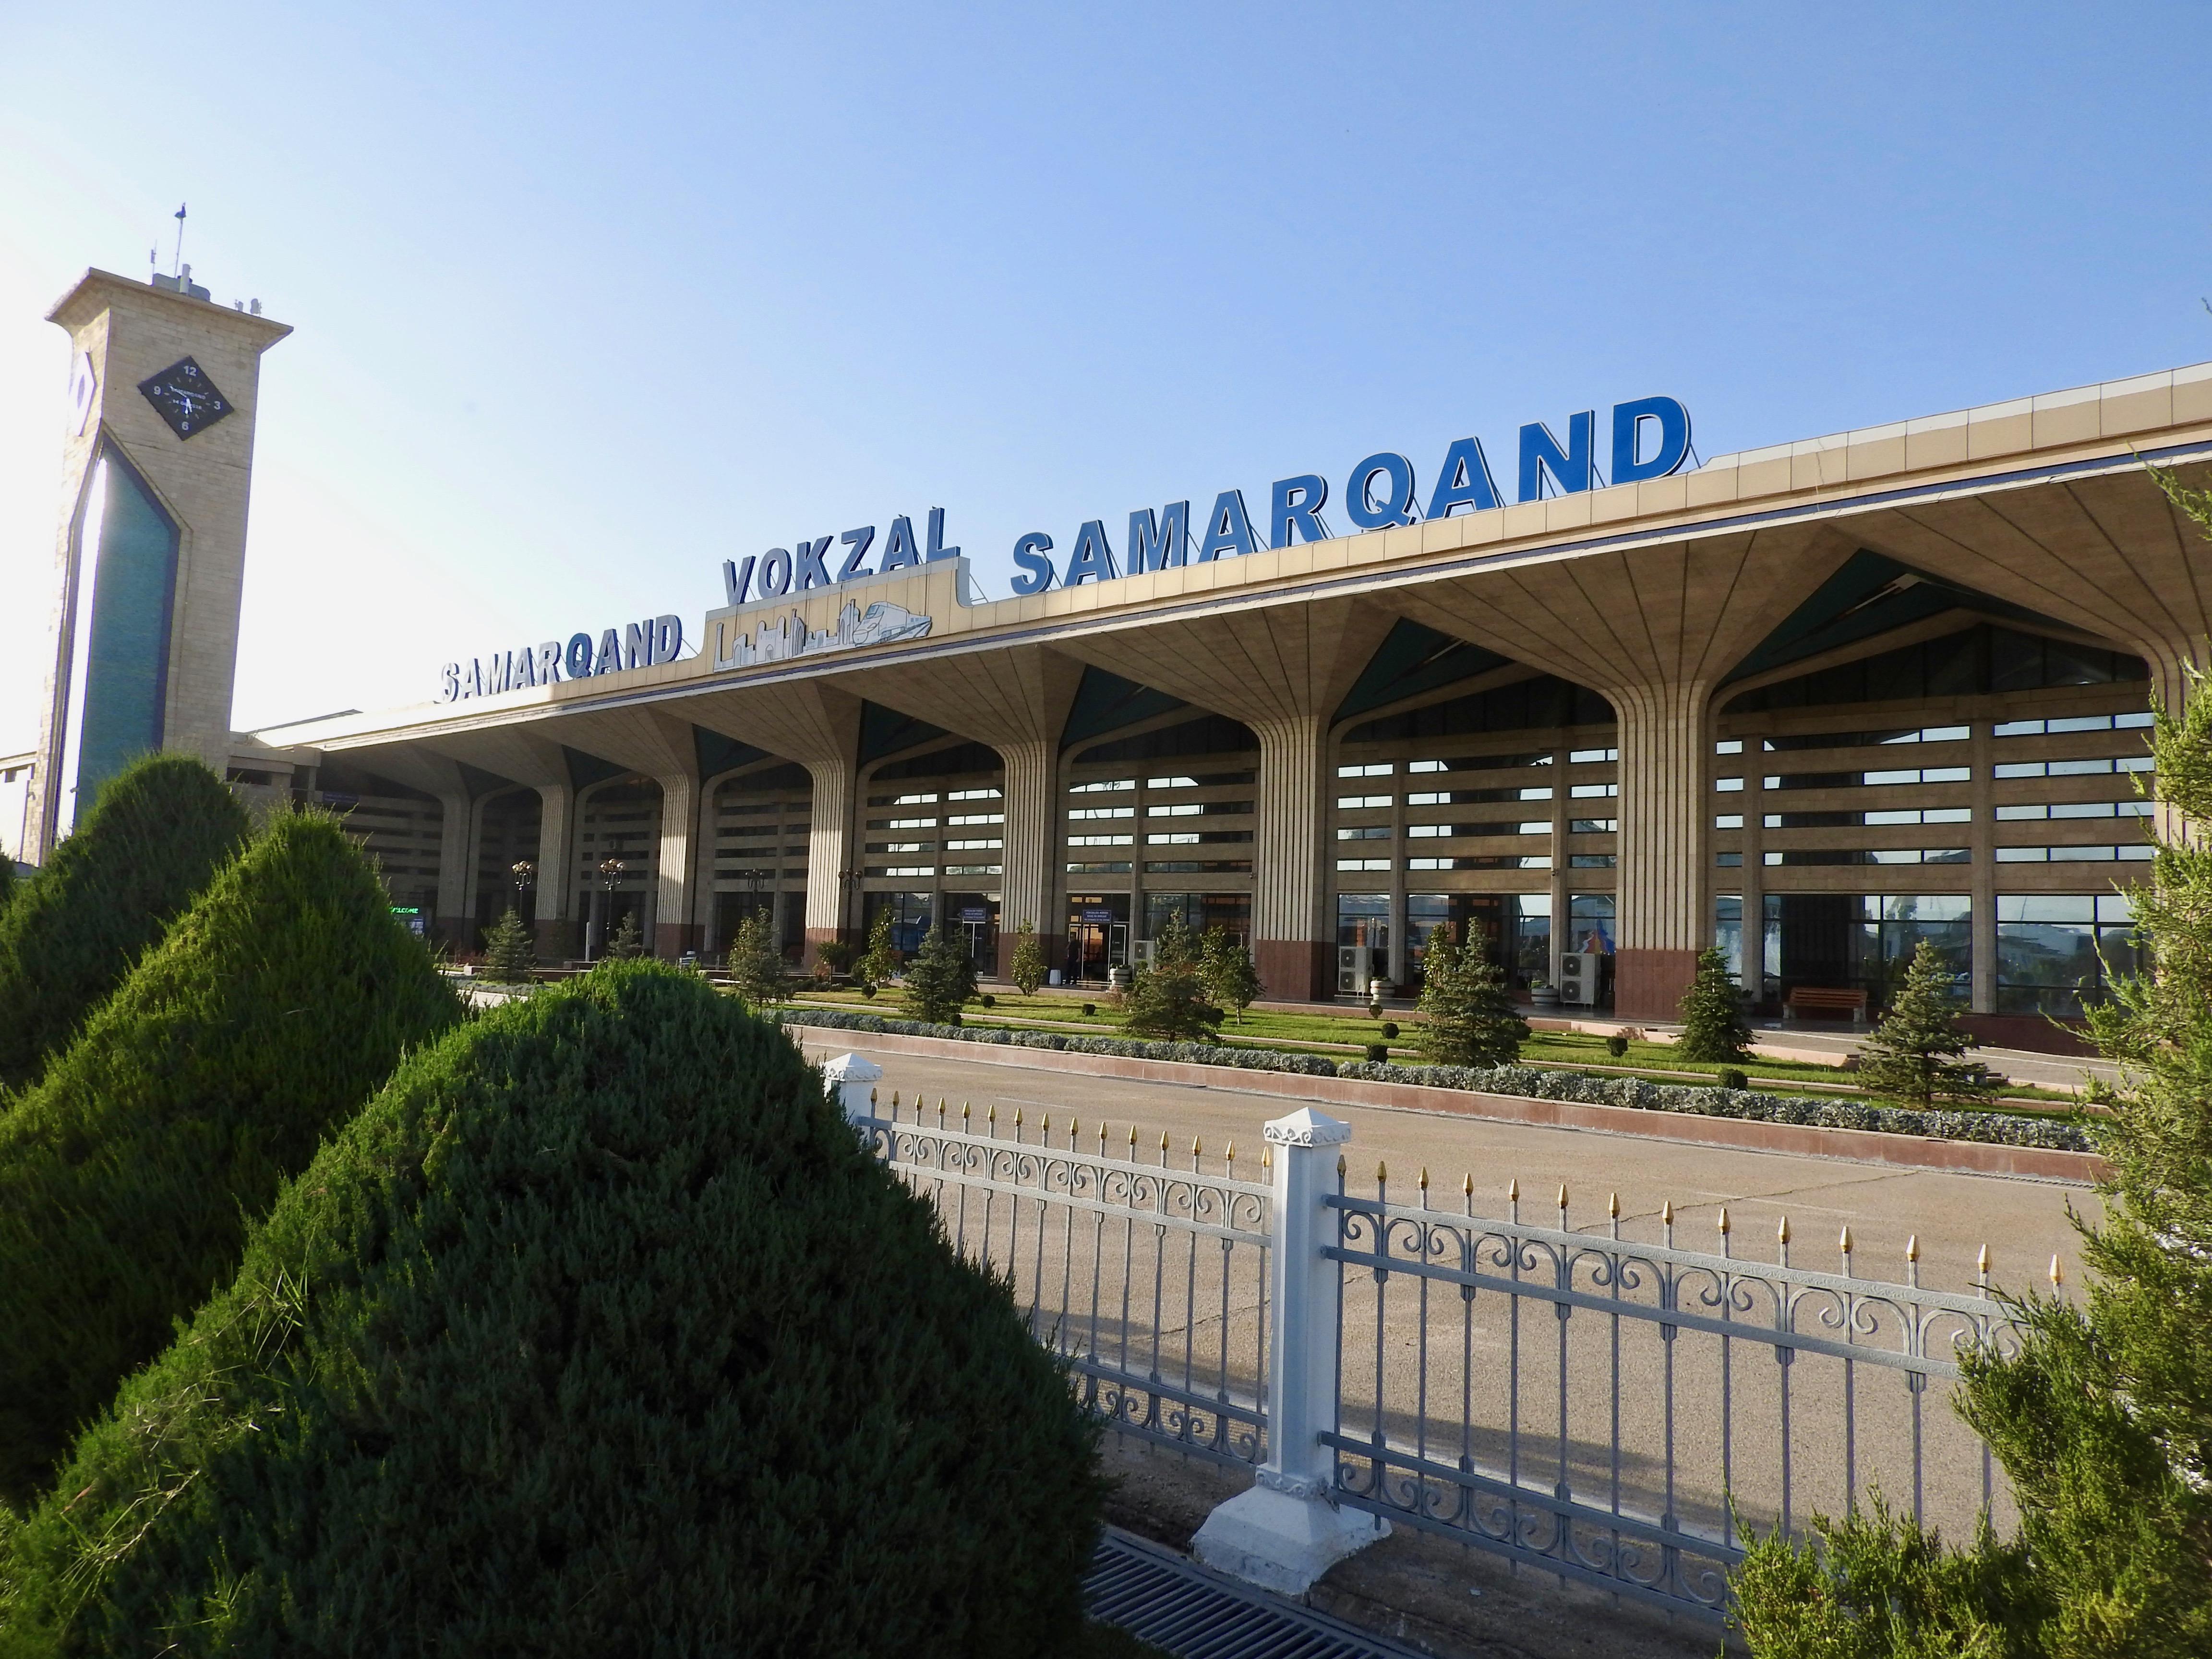 Samarkand Train Station, Uzbekistan